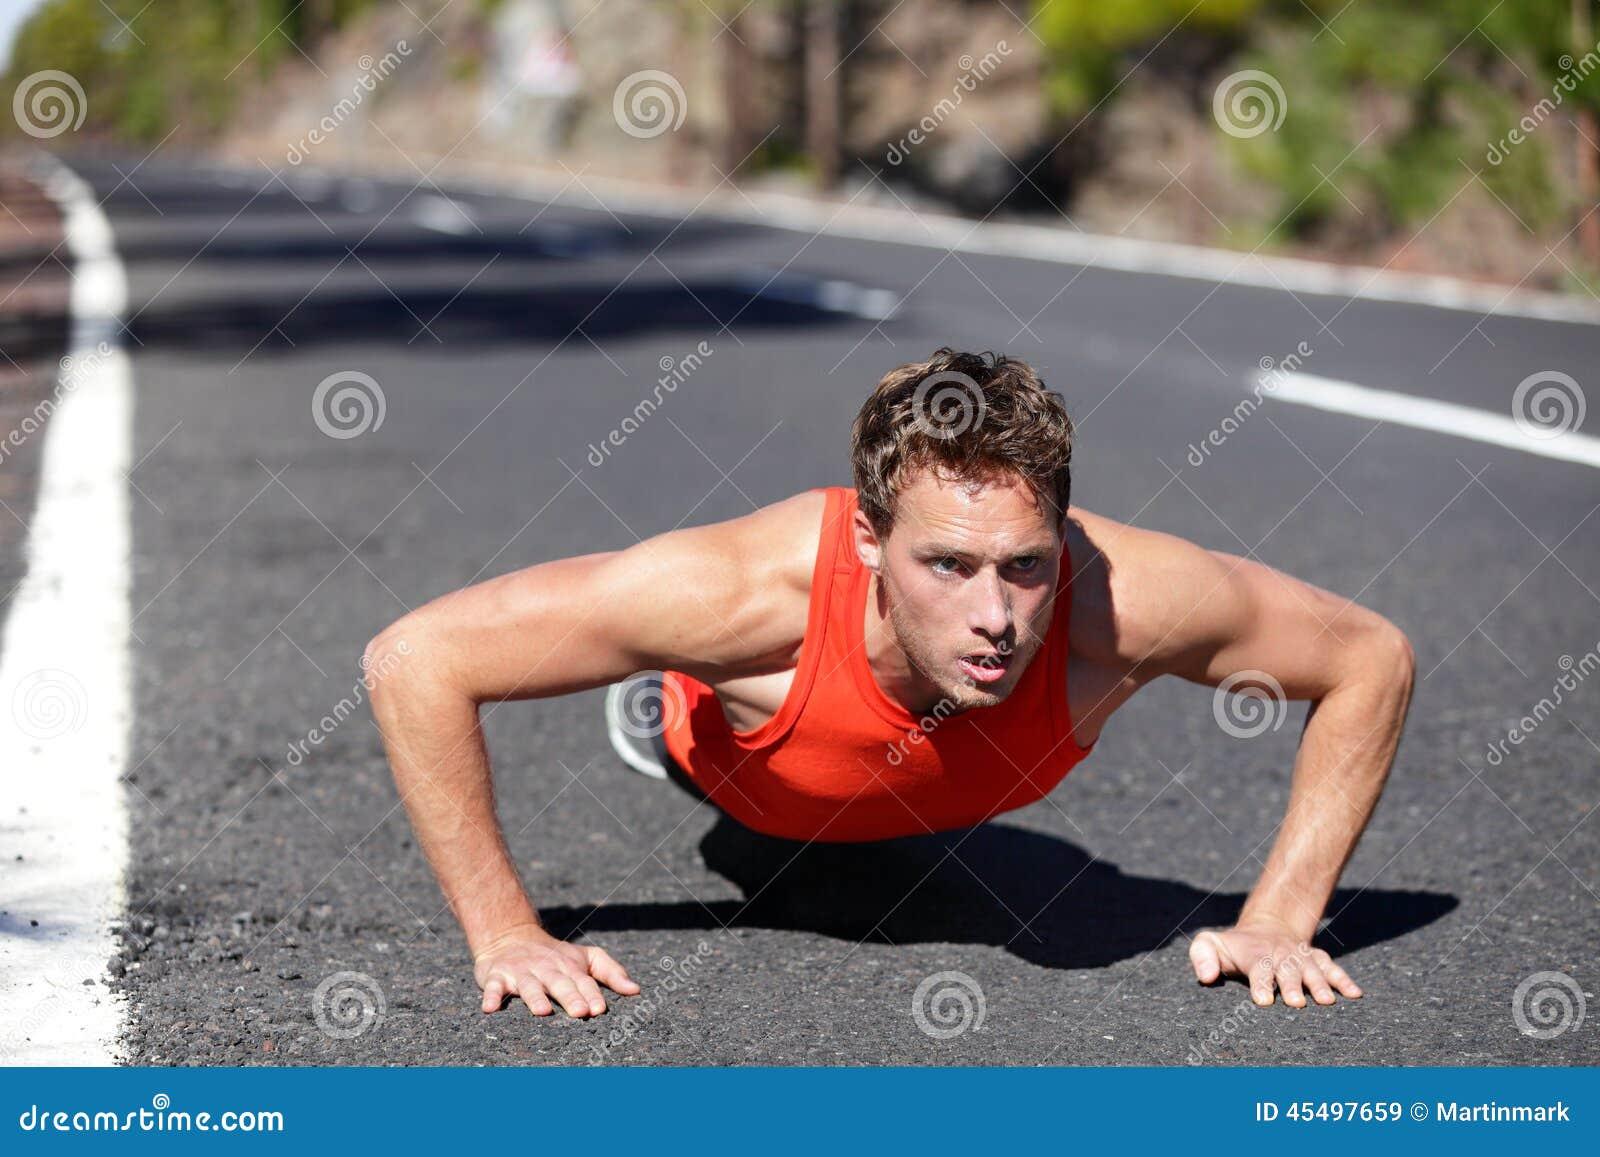 俯卧撑锻炼人训练pushup